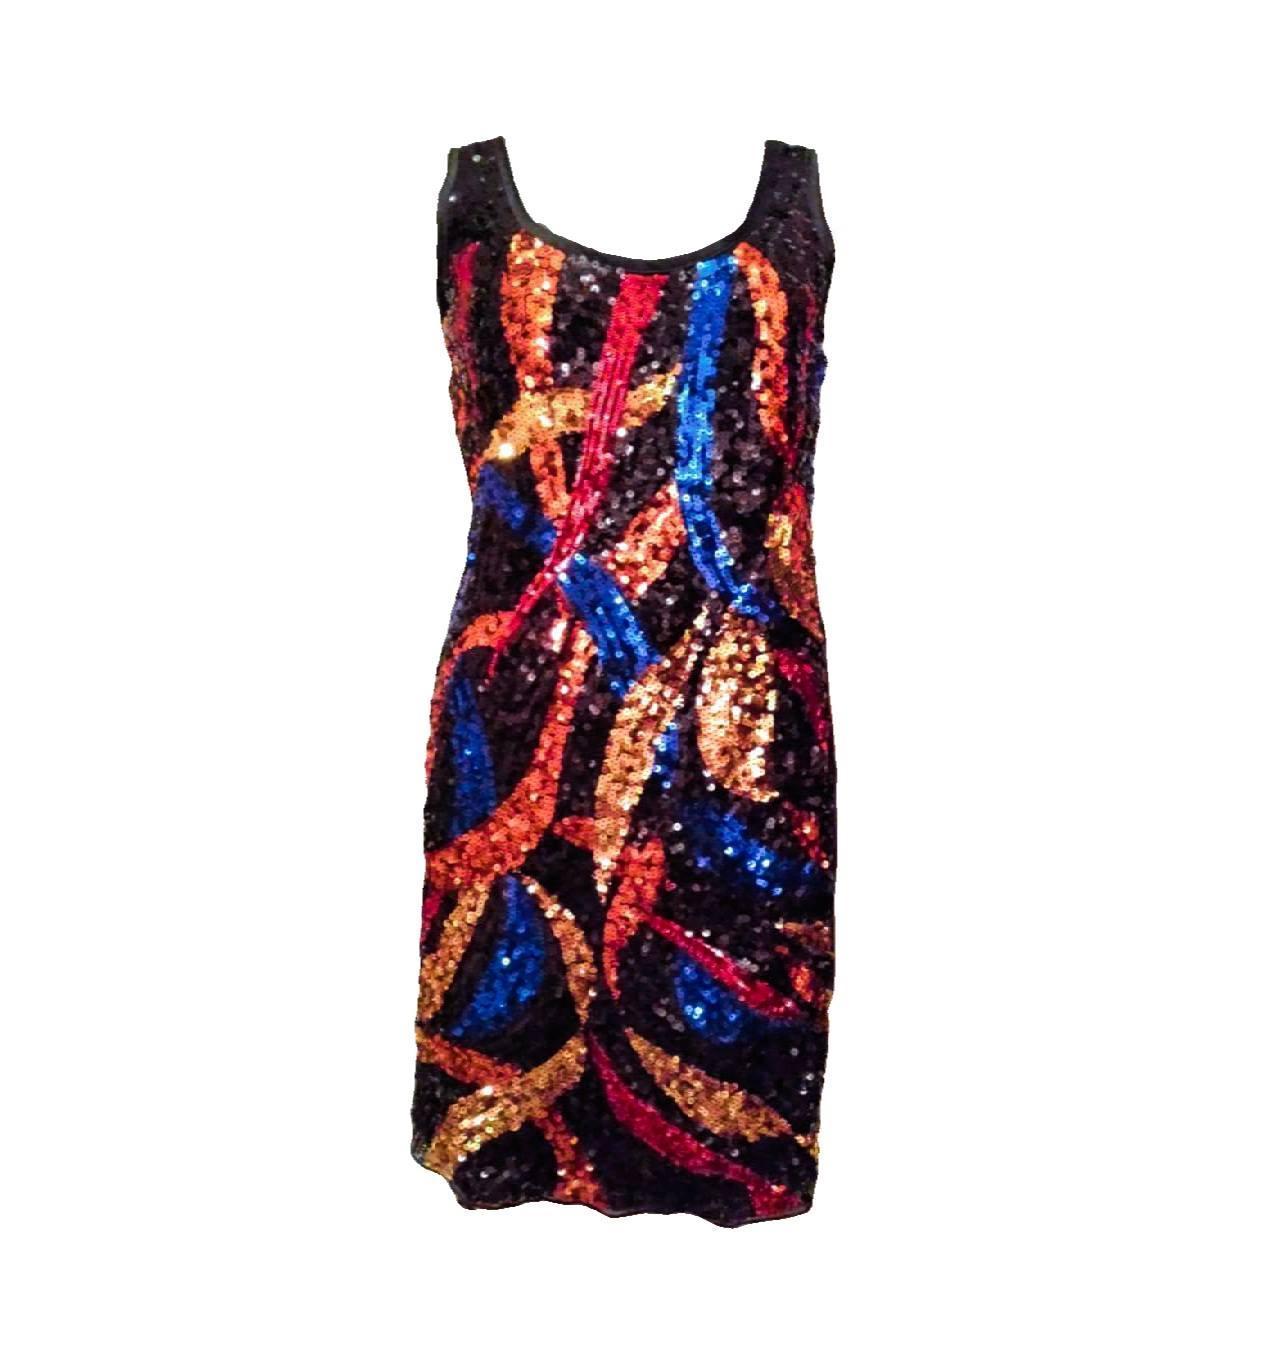 de2a6cc401d0 Vero moda flitrované šaty eyecatcher swing dress